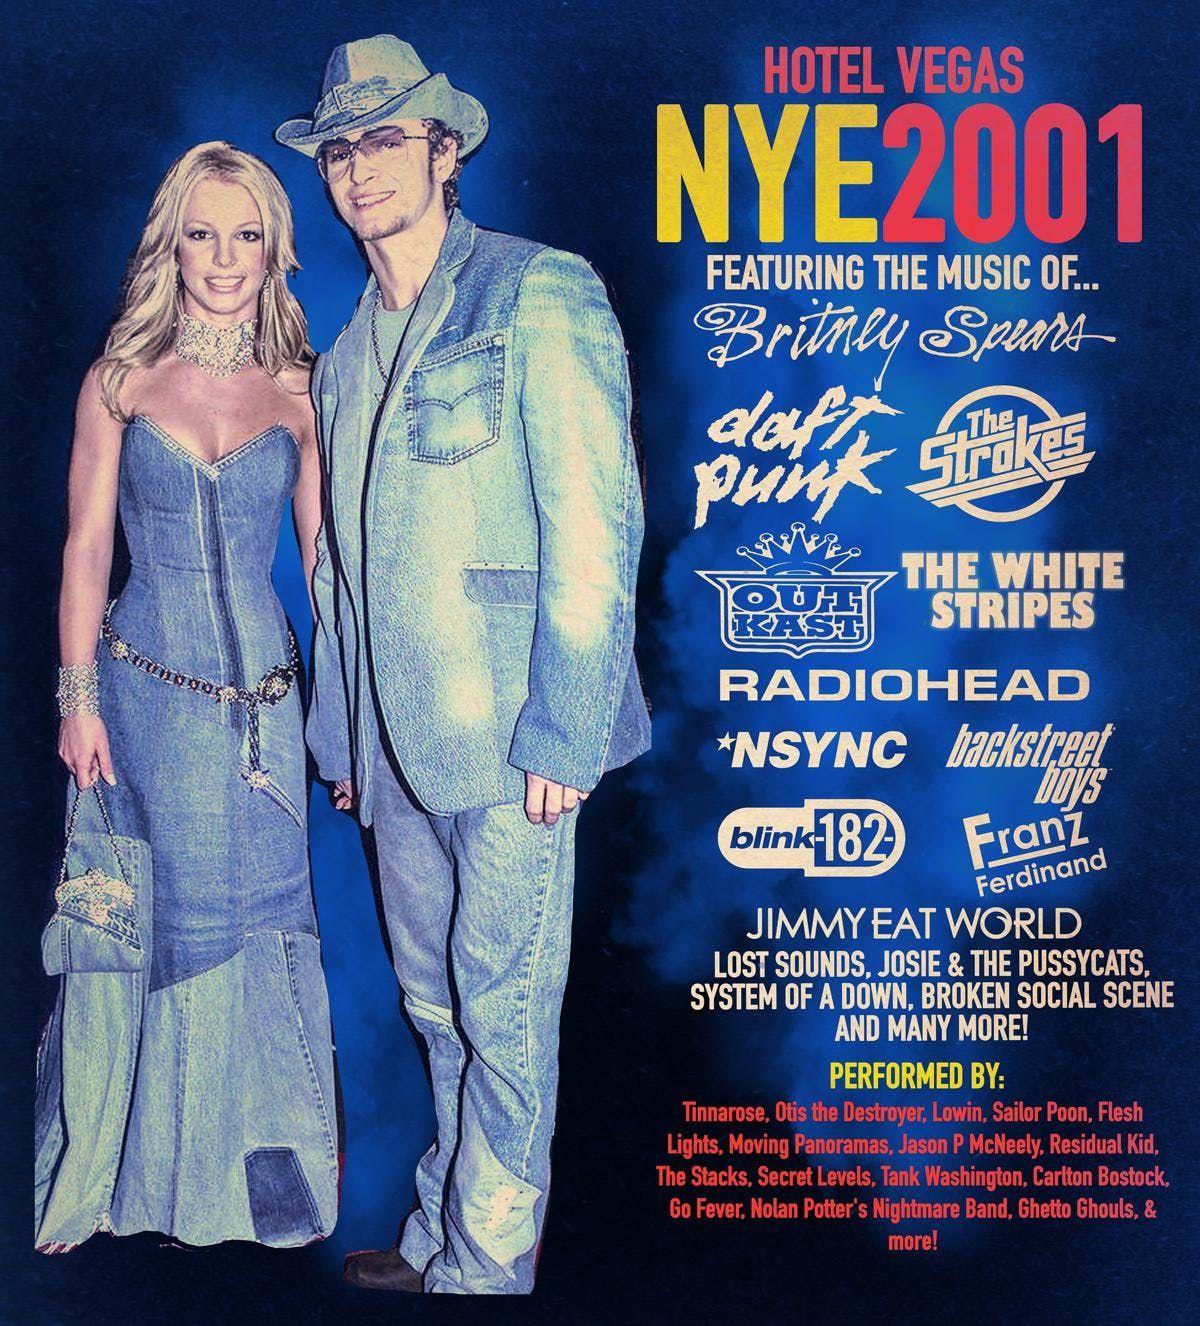 NYE 2001 at Hotel Vegas & The Volstead